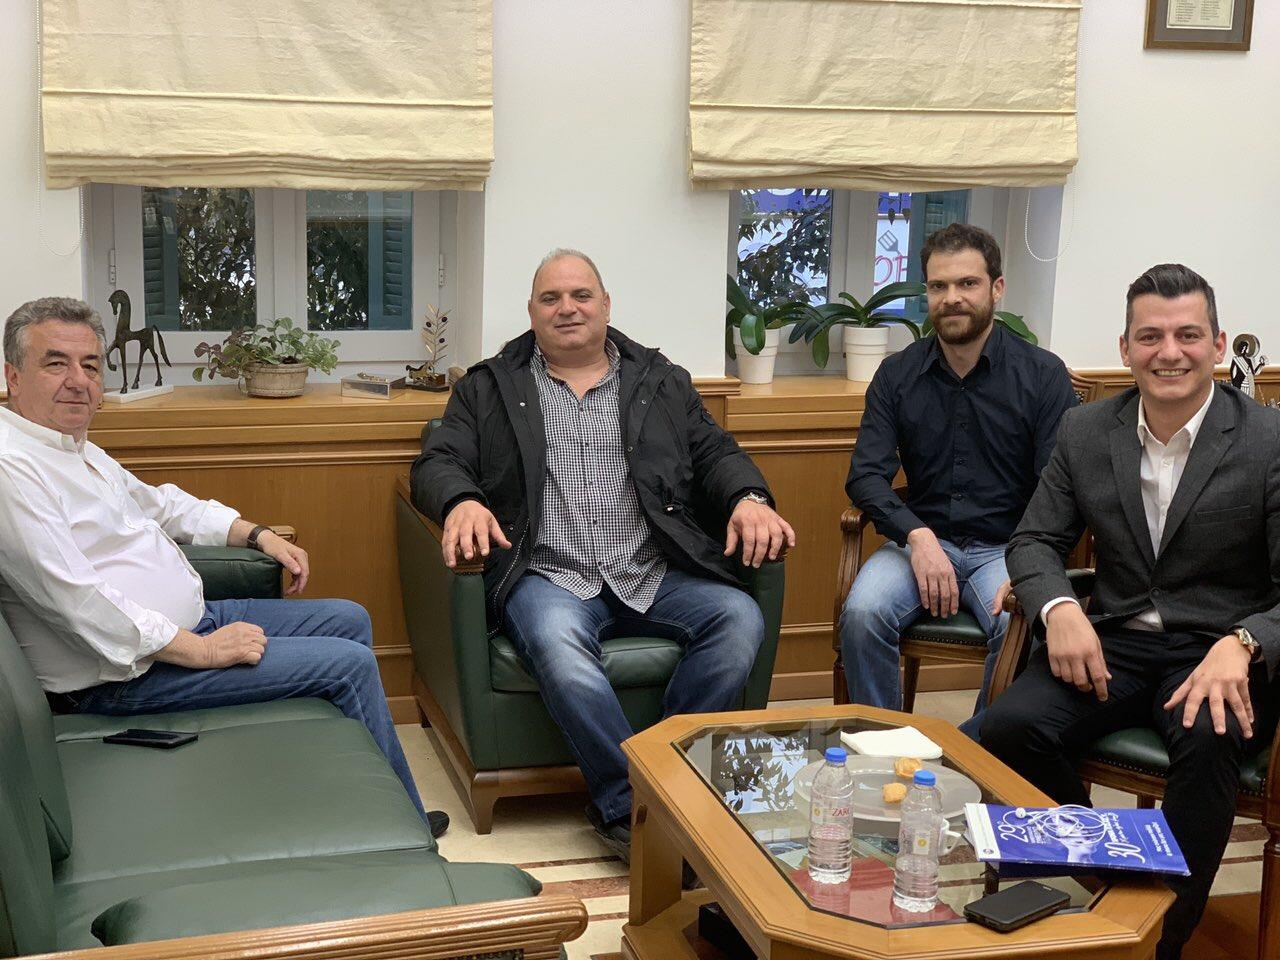 <p>Την Τρίτη 02/04/2019 και ώρα 19:00, πραγματοποιήθηκε στο Μέγαρο της Περιφέρειας Κρήτης στο Ηράκλειο, συνάντηση με τον Περιφερειάρχη Κρήτης, κ. ΑΡΝΑΟΥΤΑΚΗ Σταύρο, παρουσία του Προέδρου ΚΑΡΤΣΑΚΗ Γεωργίου, του Αντιπροέδρου ΒΑΜΒΑΣΑΚΗ Μιχαήλ και του Γενικού Γραμματέα ΣΠΥΡΙΔΑΚΗ Μιχαήλ της Ένωσής μας. Μέσα σε κλίμα αμοιβαίας συμπάθειας και συνεργασίας, τον ενημερώσαμε ότι [&hellip;]</p>